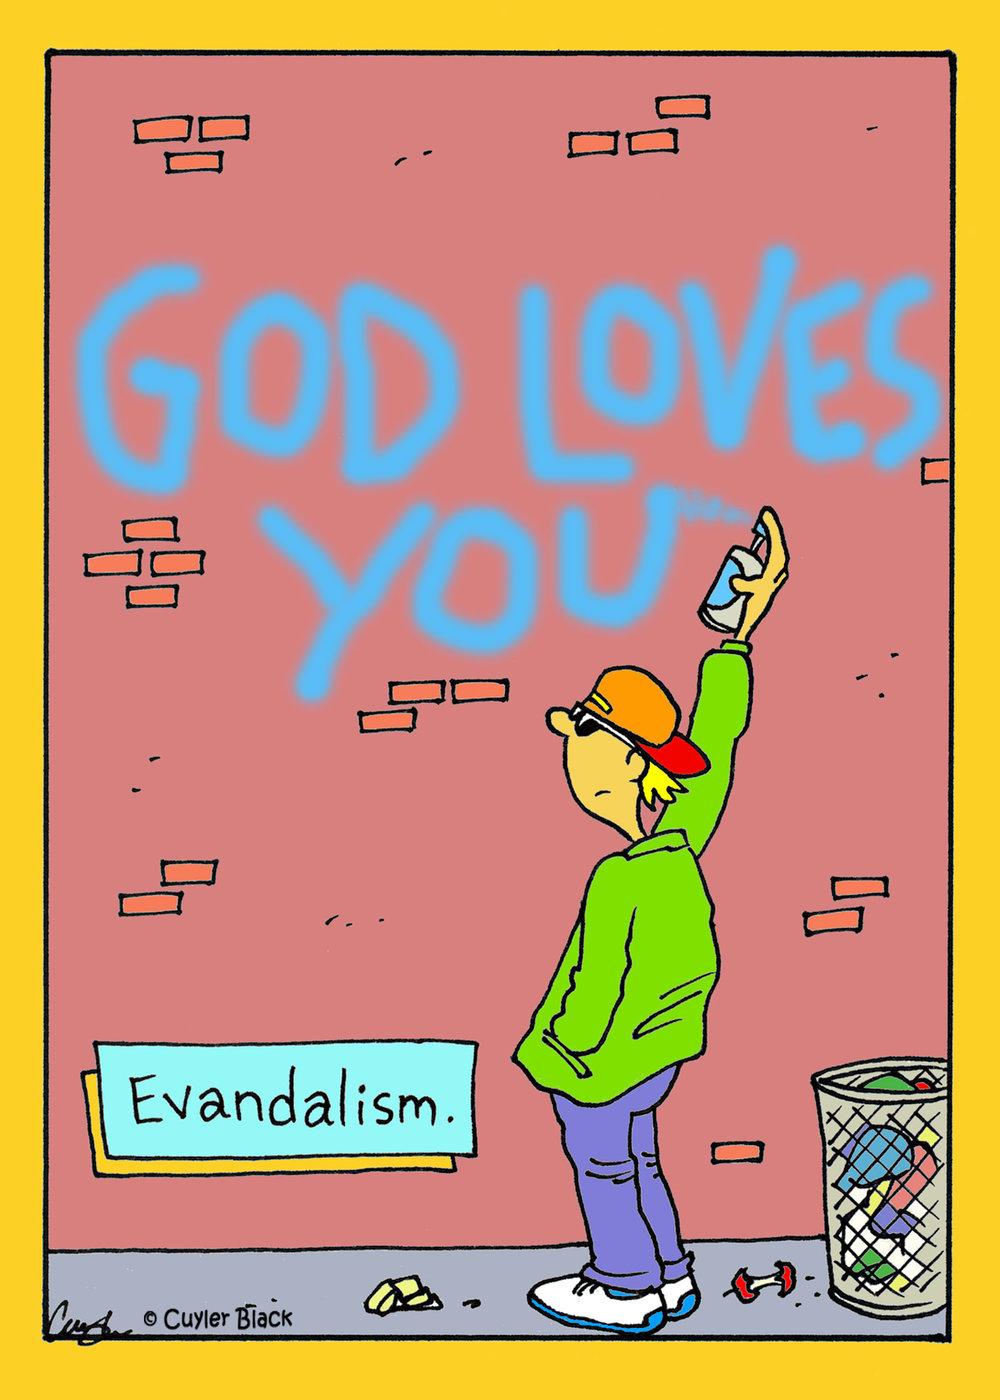 evandalism.jpg